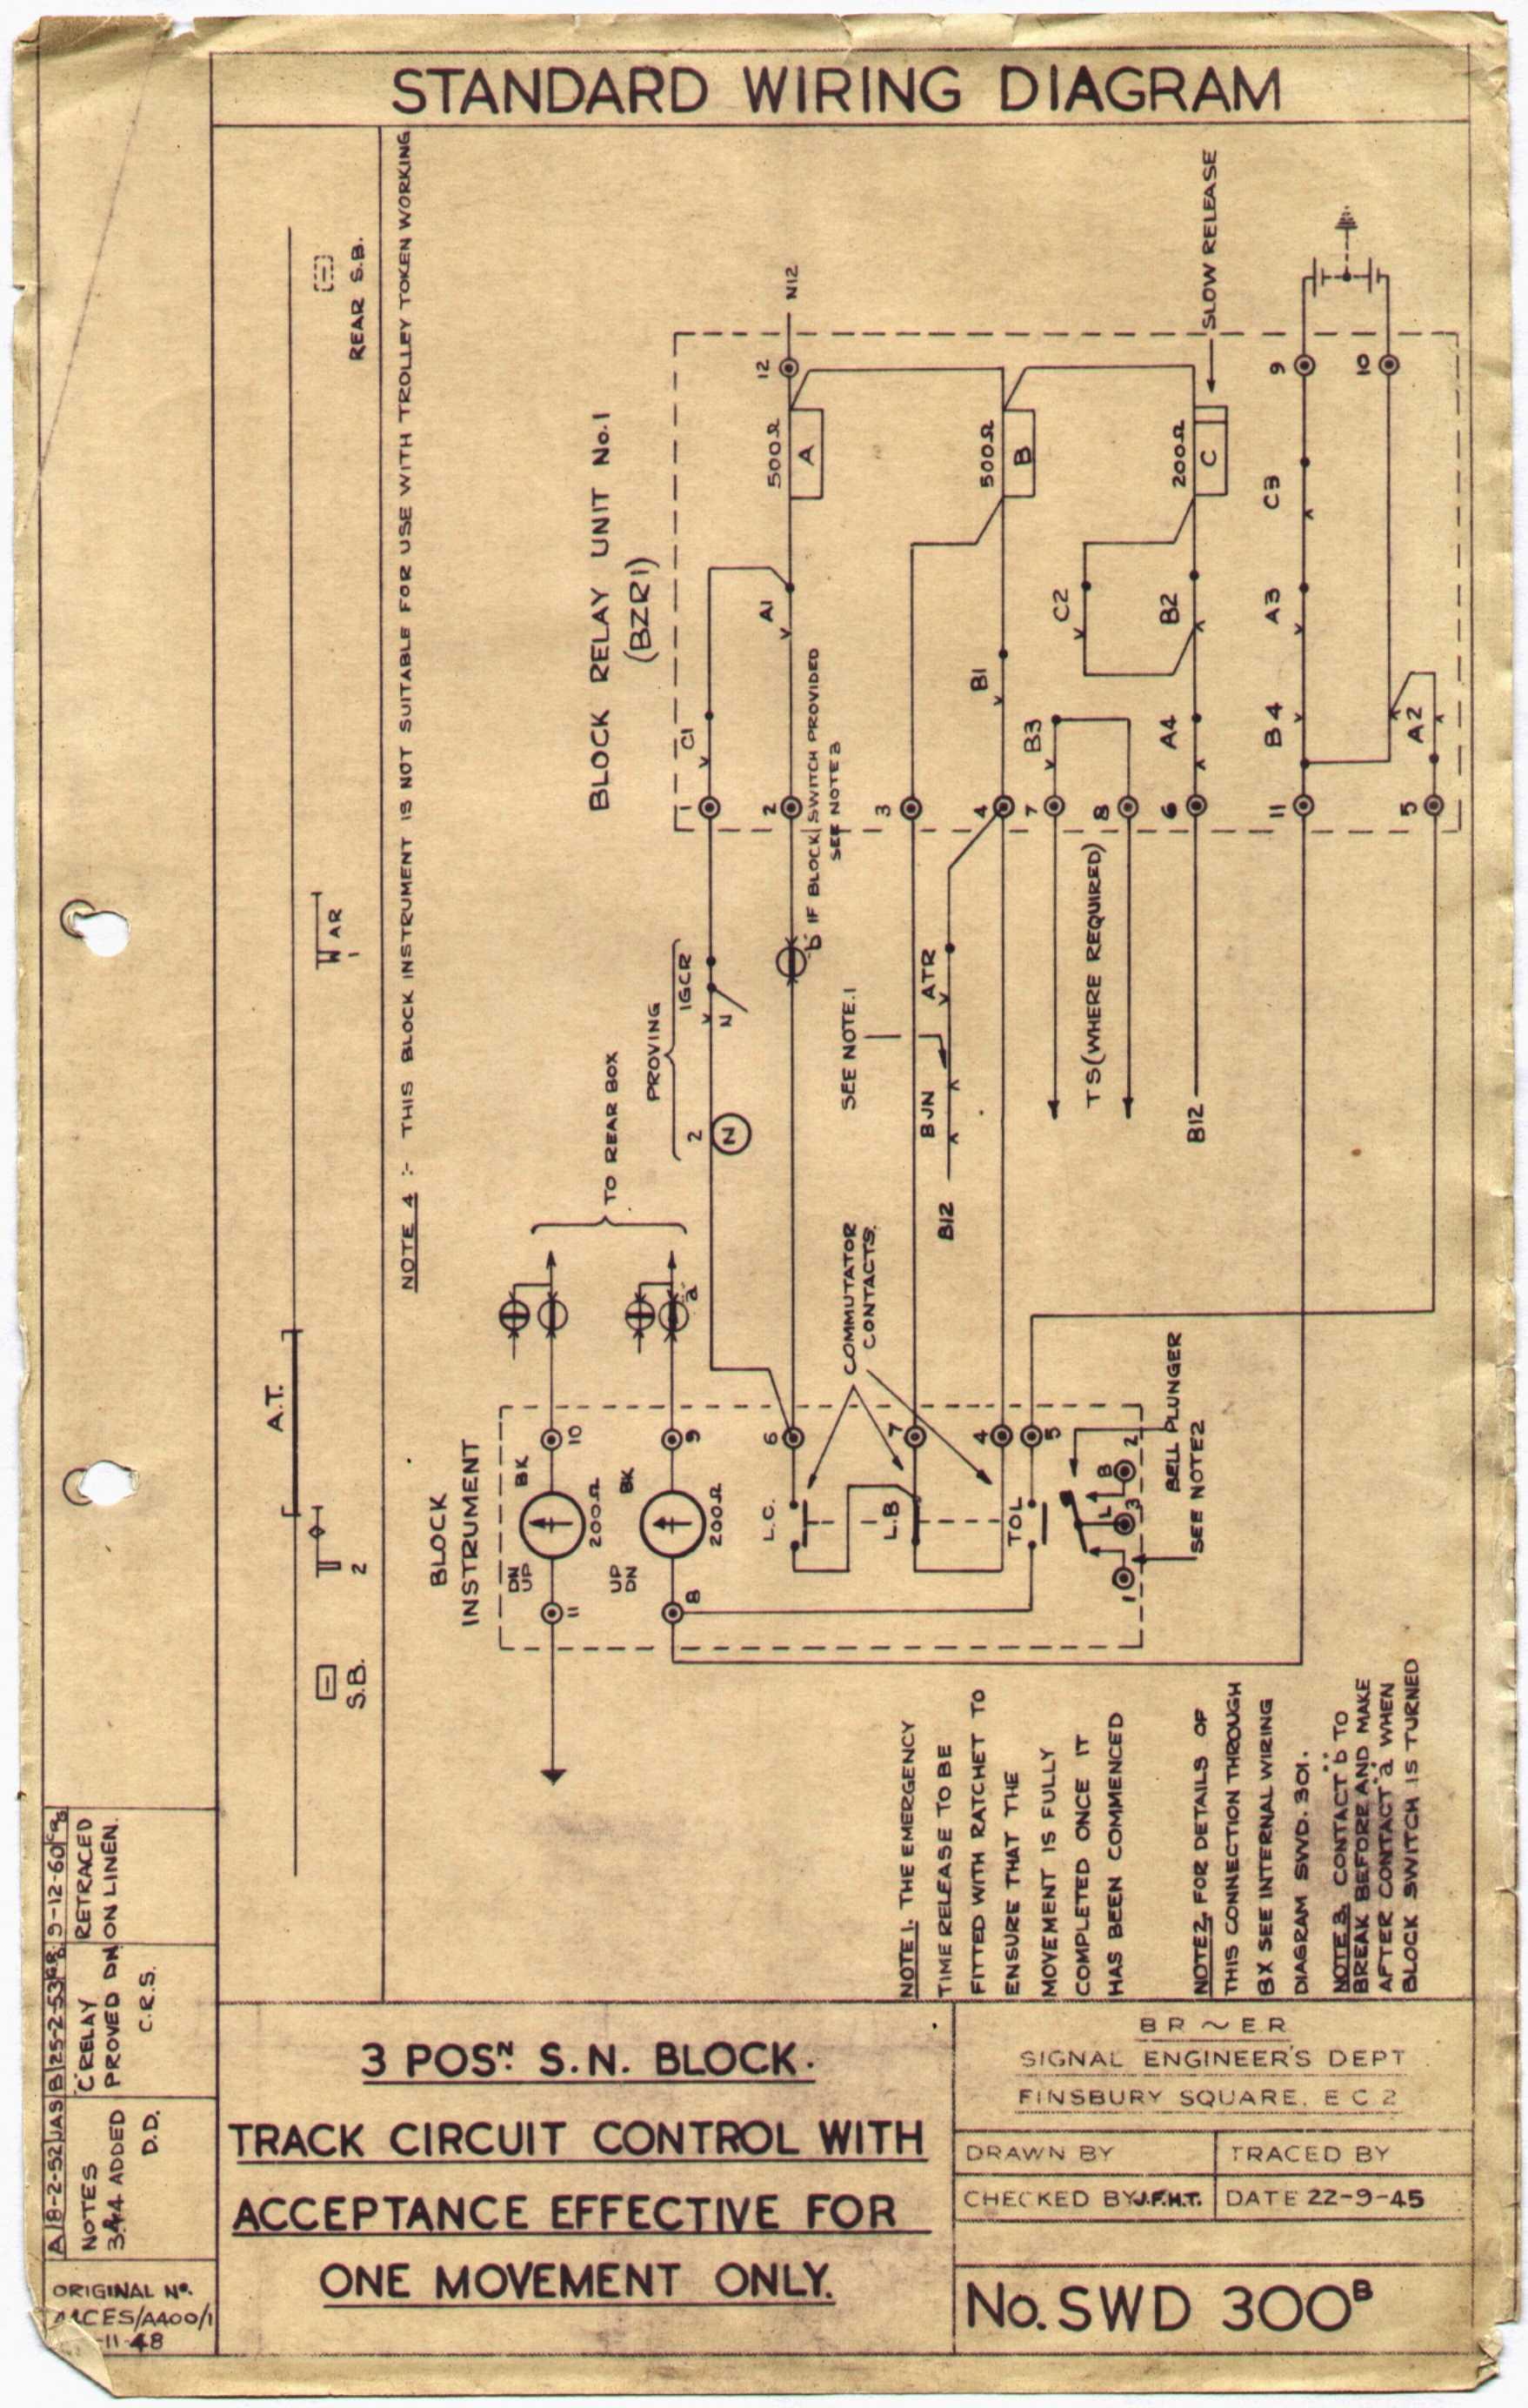 lner block instruments rh lymmobservatory net Ses Simplex Control S10020n1 Wiring 05 W4500 Wiring Radio